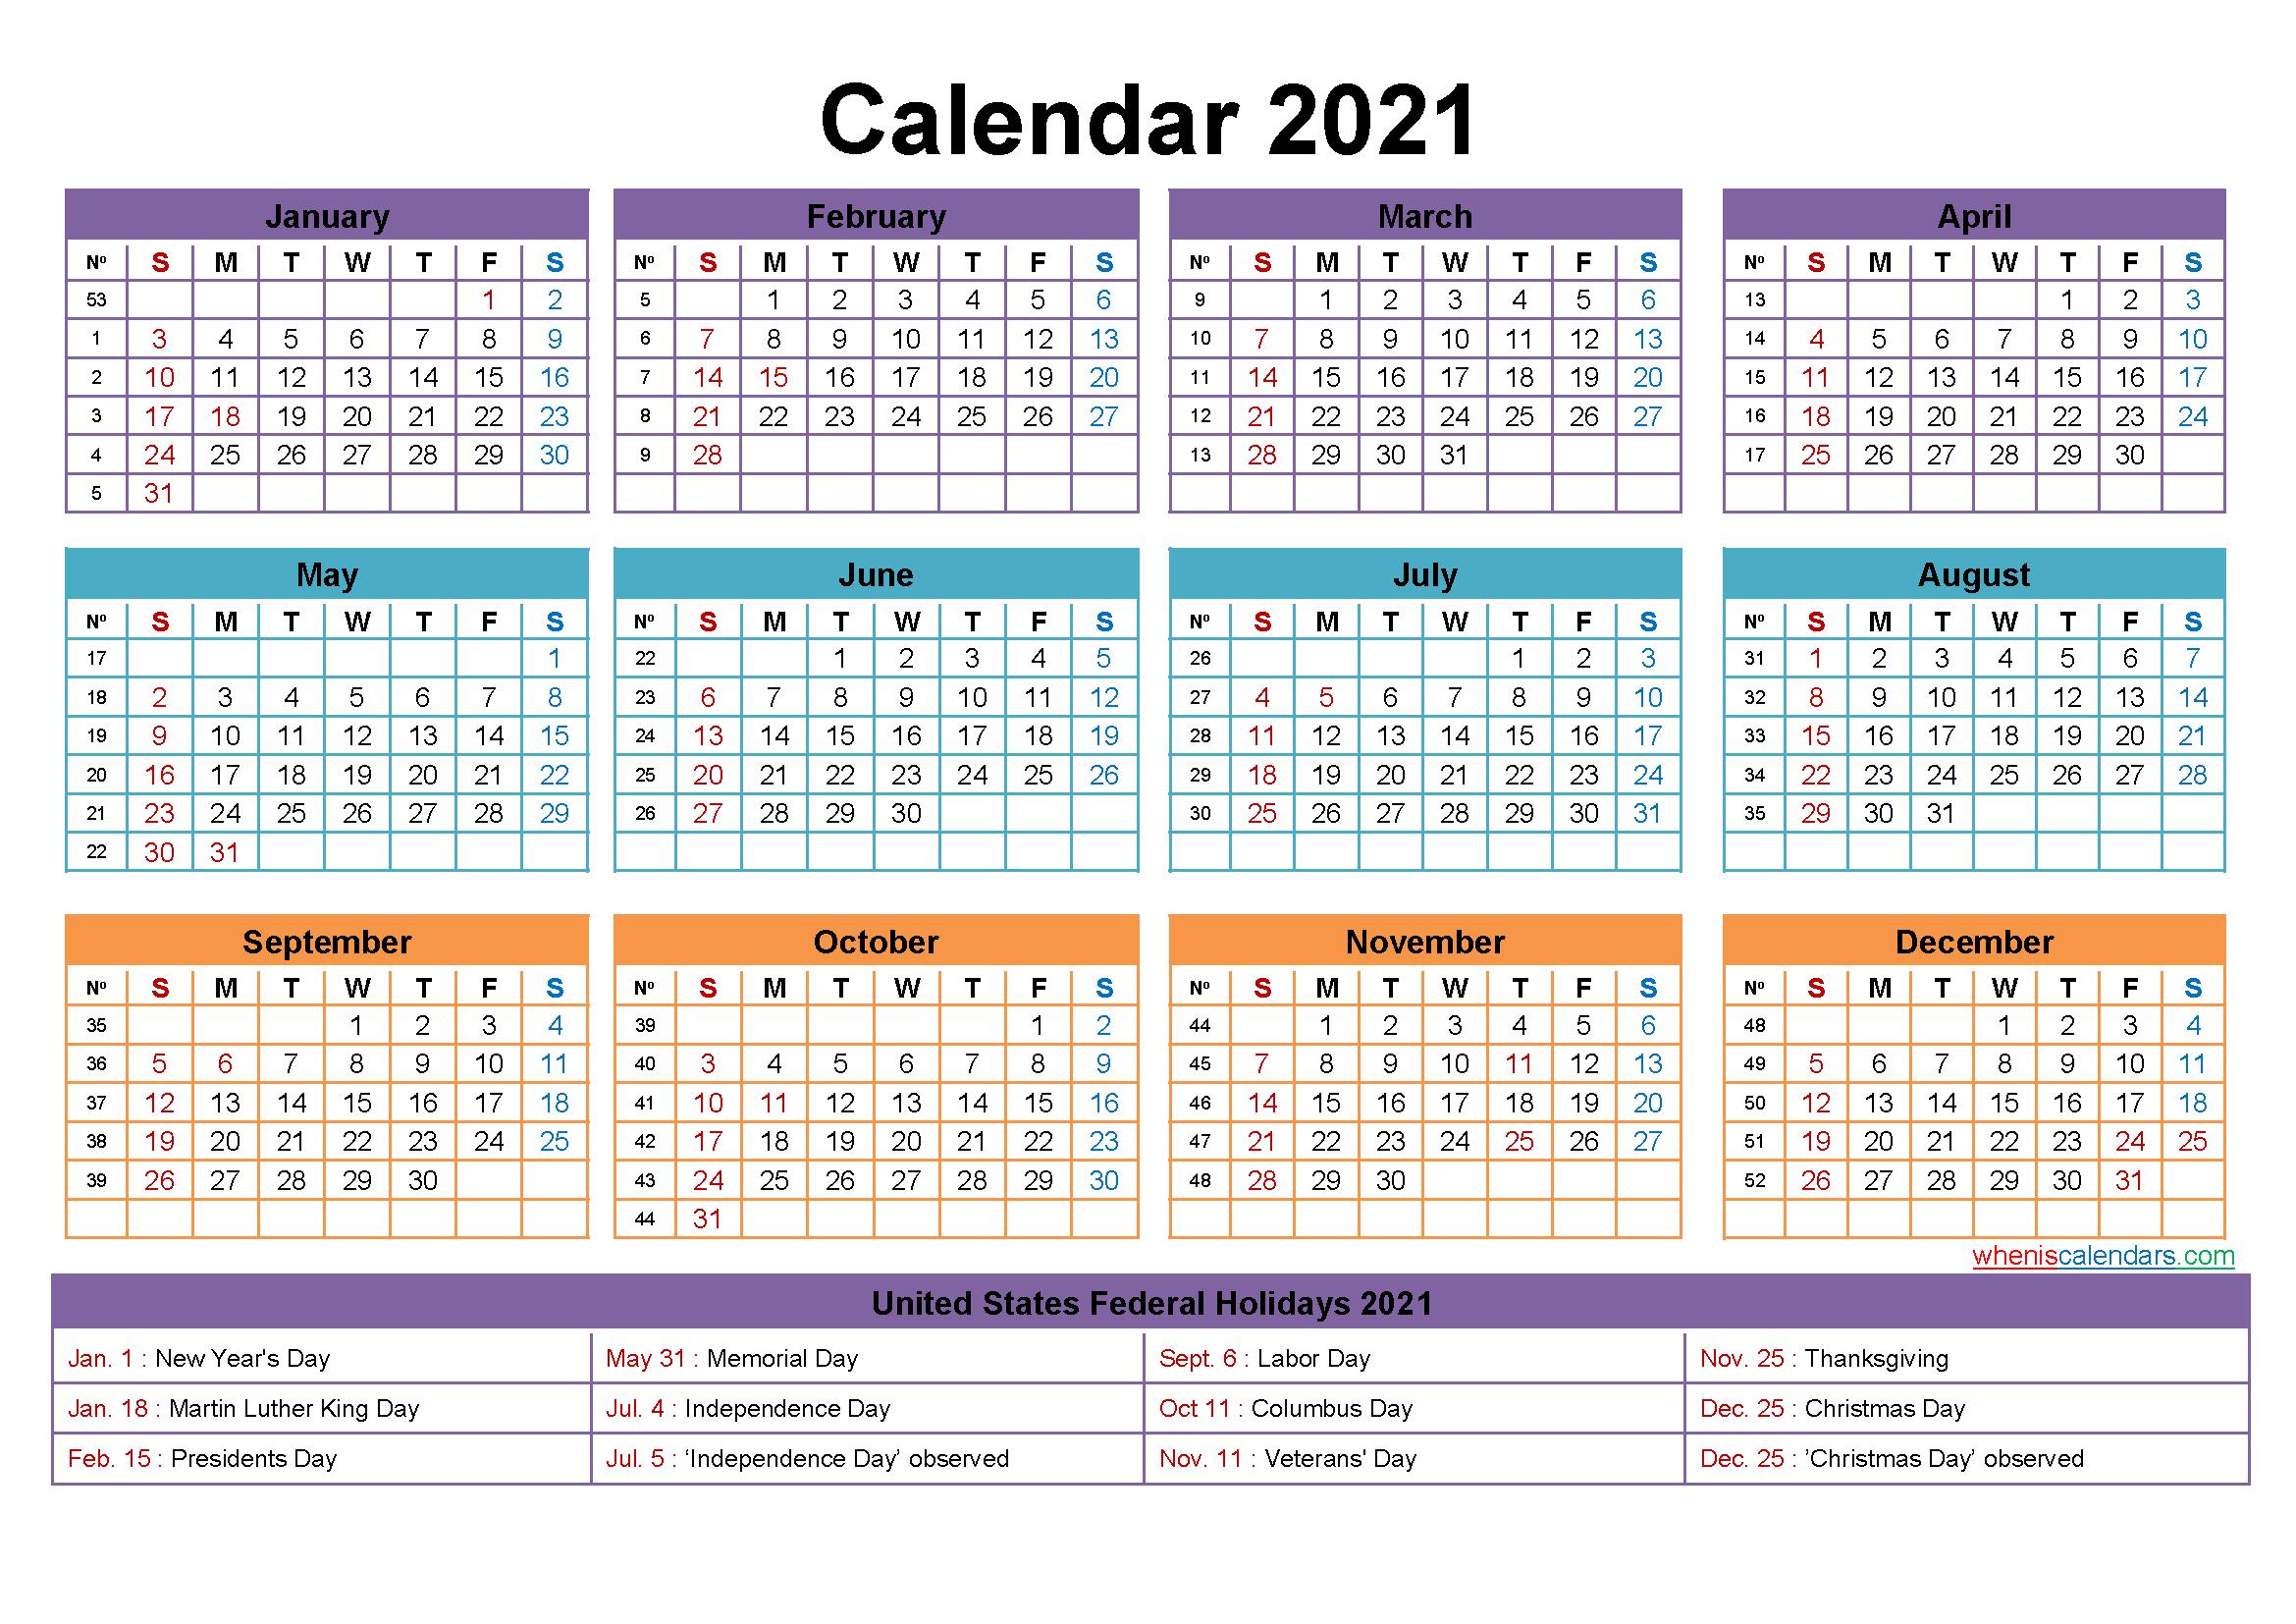 Free Editable Printable Calendar 2021 - Template No-Microsoft Word Calendar Template 2021